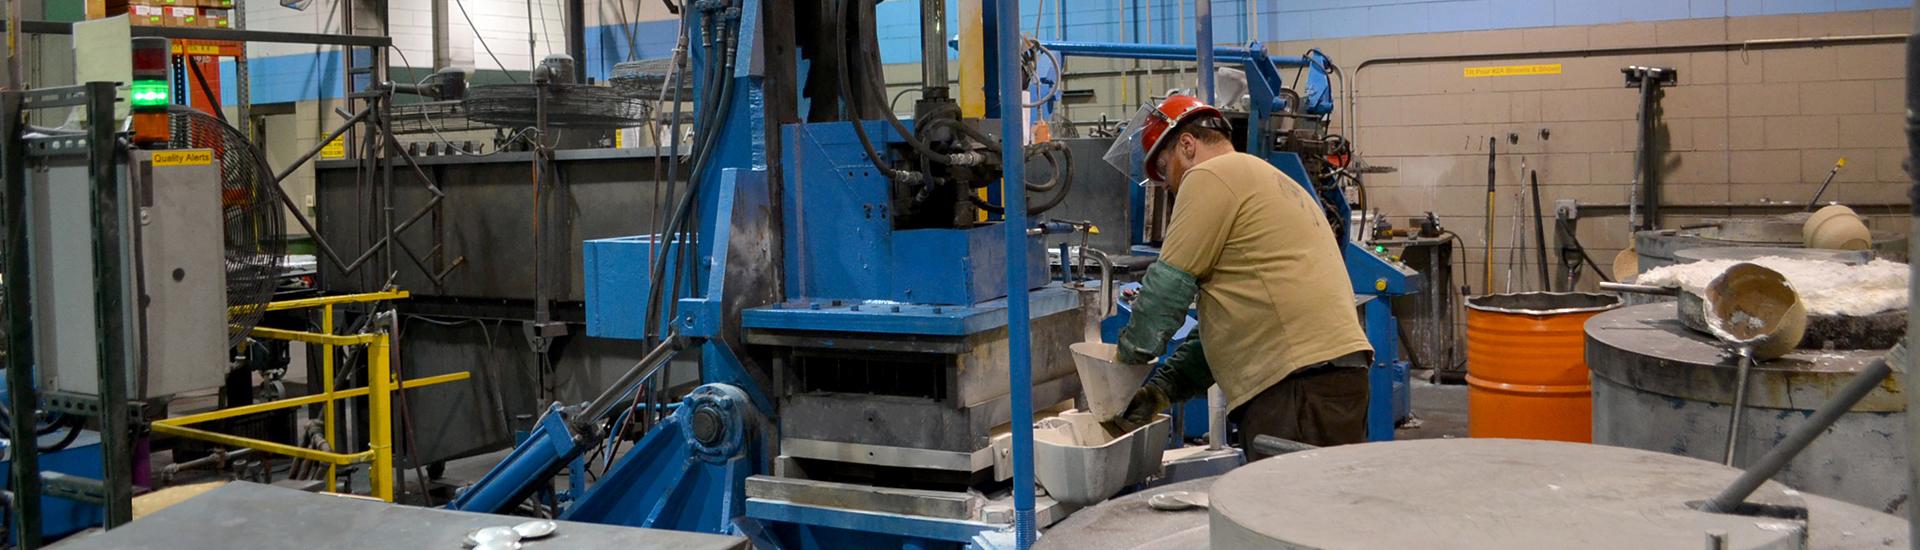 Premier Aluminum home page banner image 1.